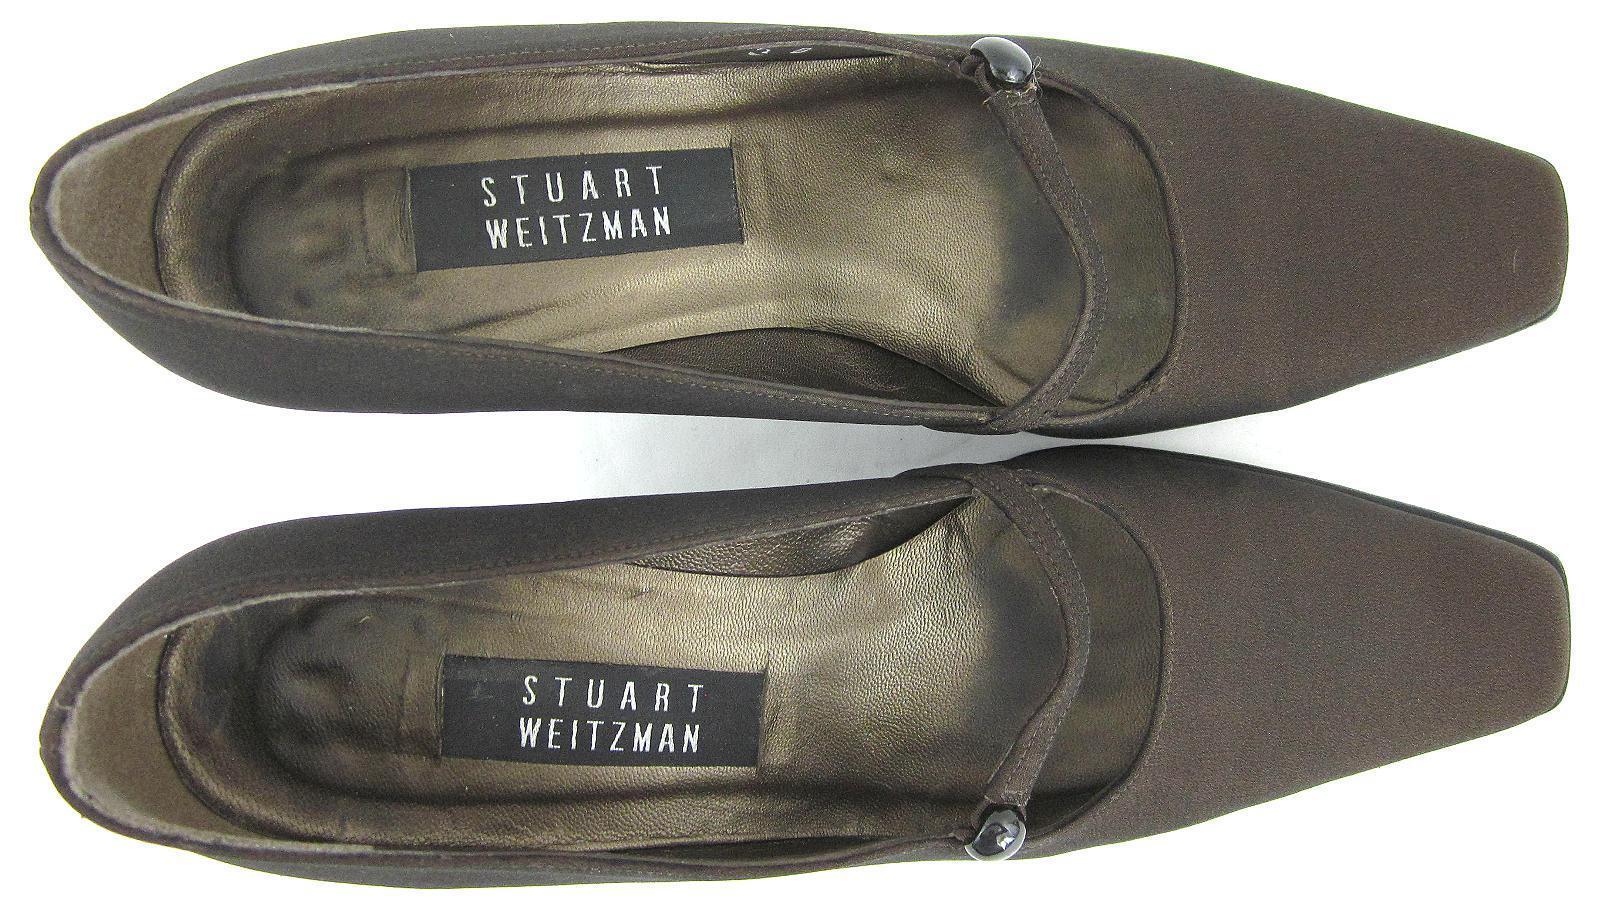 Stuart Weitzman Mary Jane Strap Pumps Pumps Pumps braun Fabric Sz 7.5B 3fc591